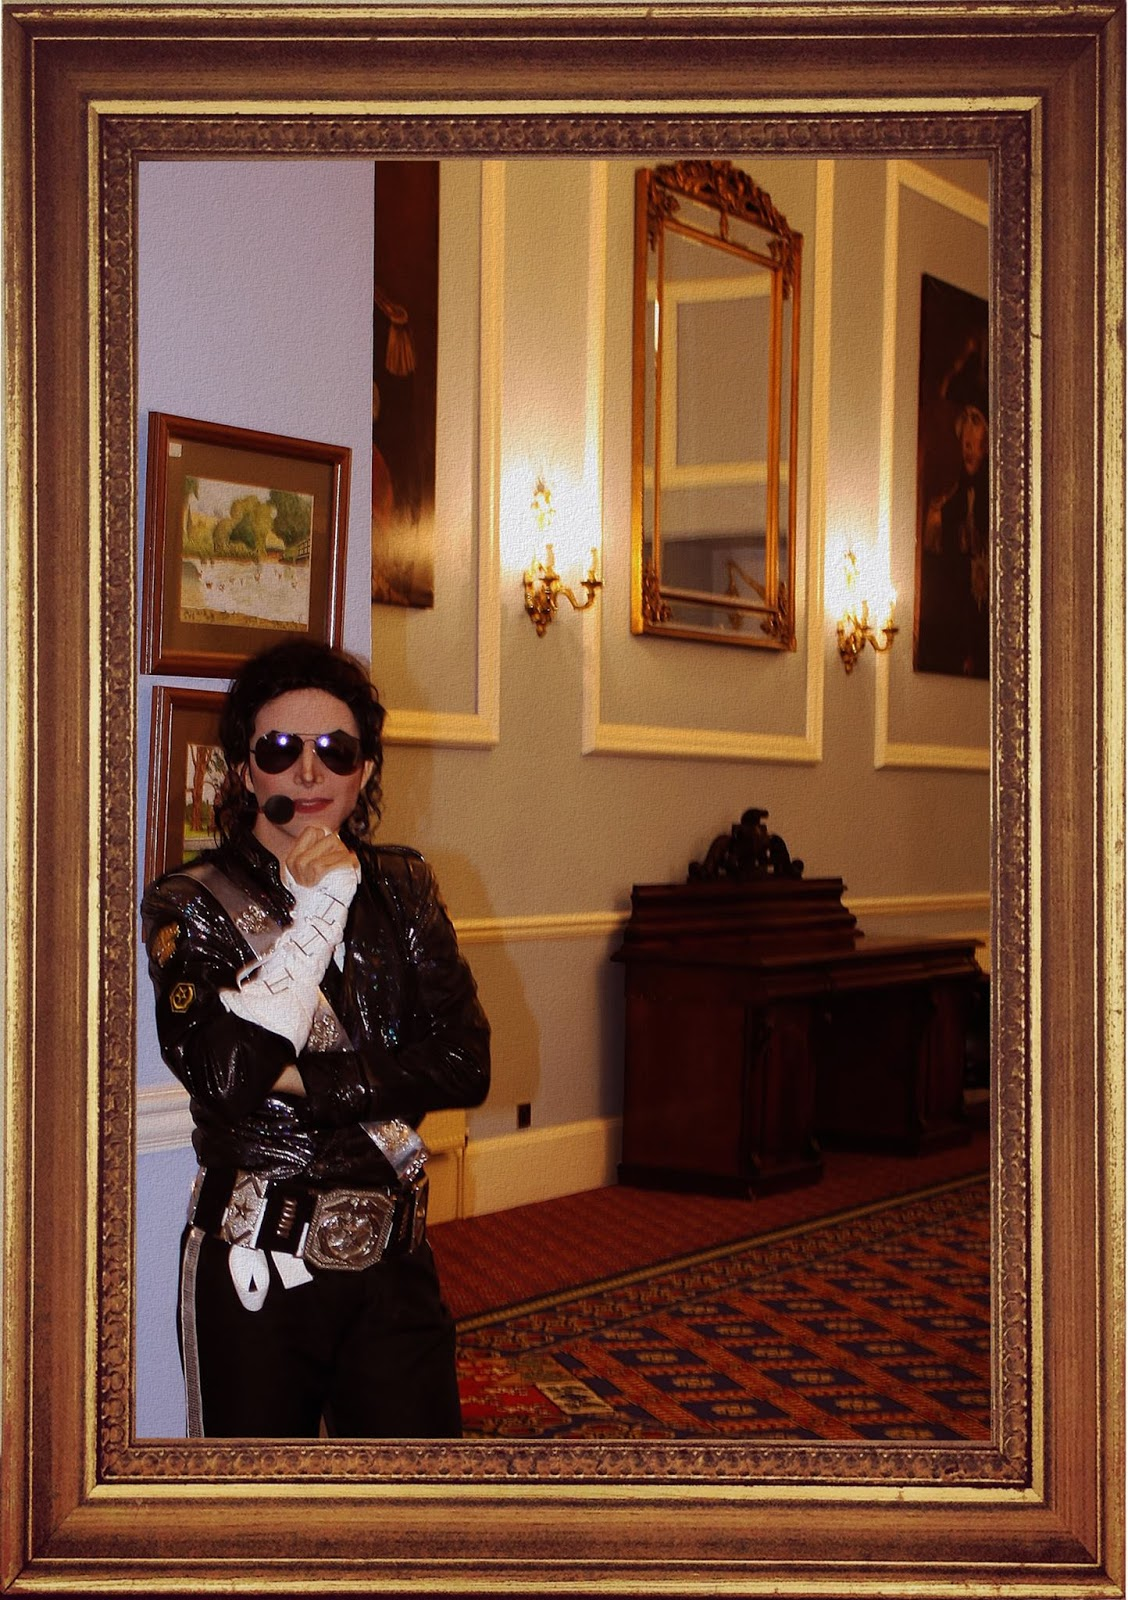 Delfim Miranda - Michael Jackson Tribute - Hotel - United Kingdom